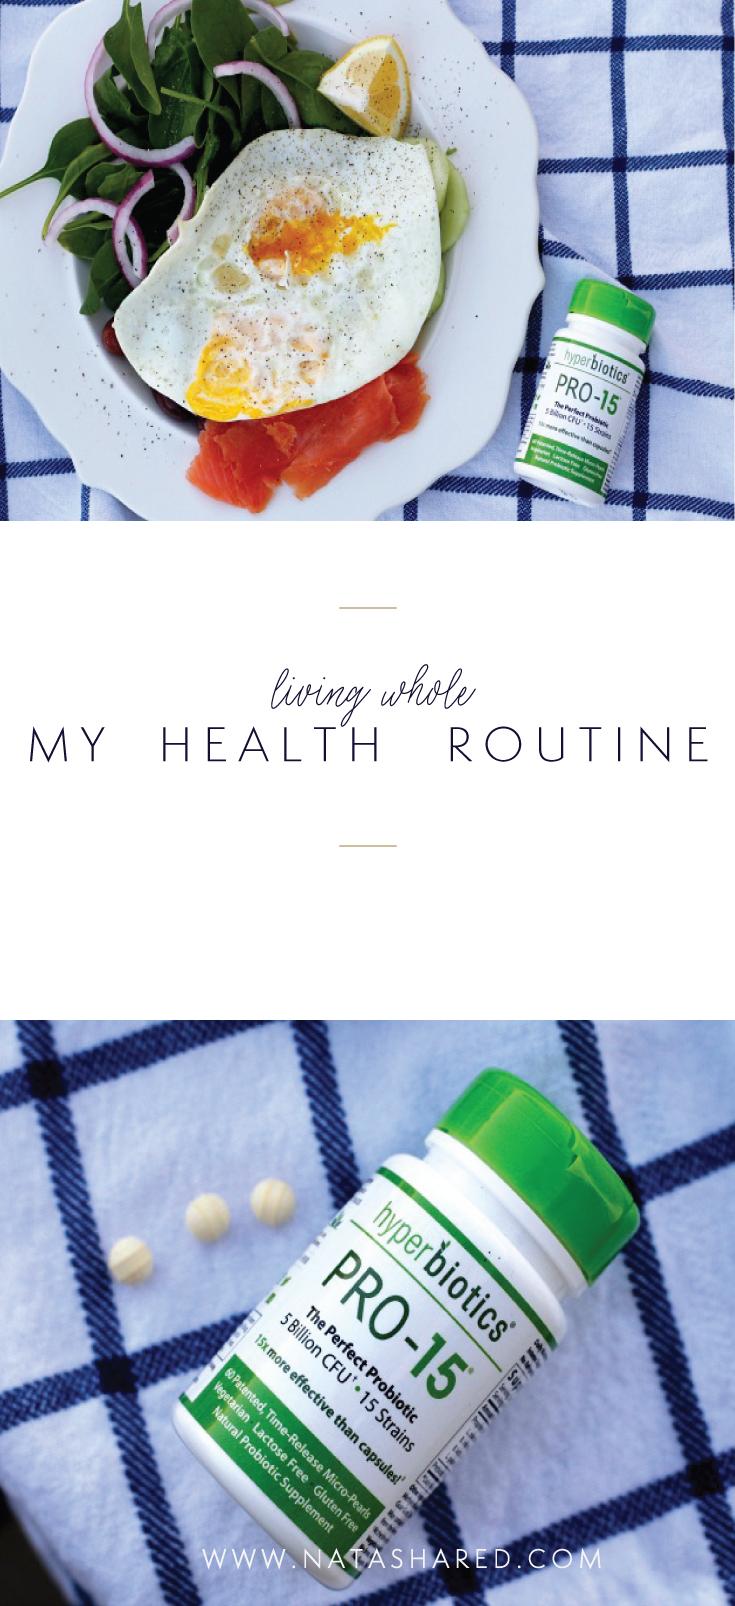 My Health Routine - exercise, vitamins + good food! Featuring Hyperbiotics probiotics // NR Blog